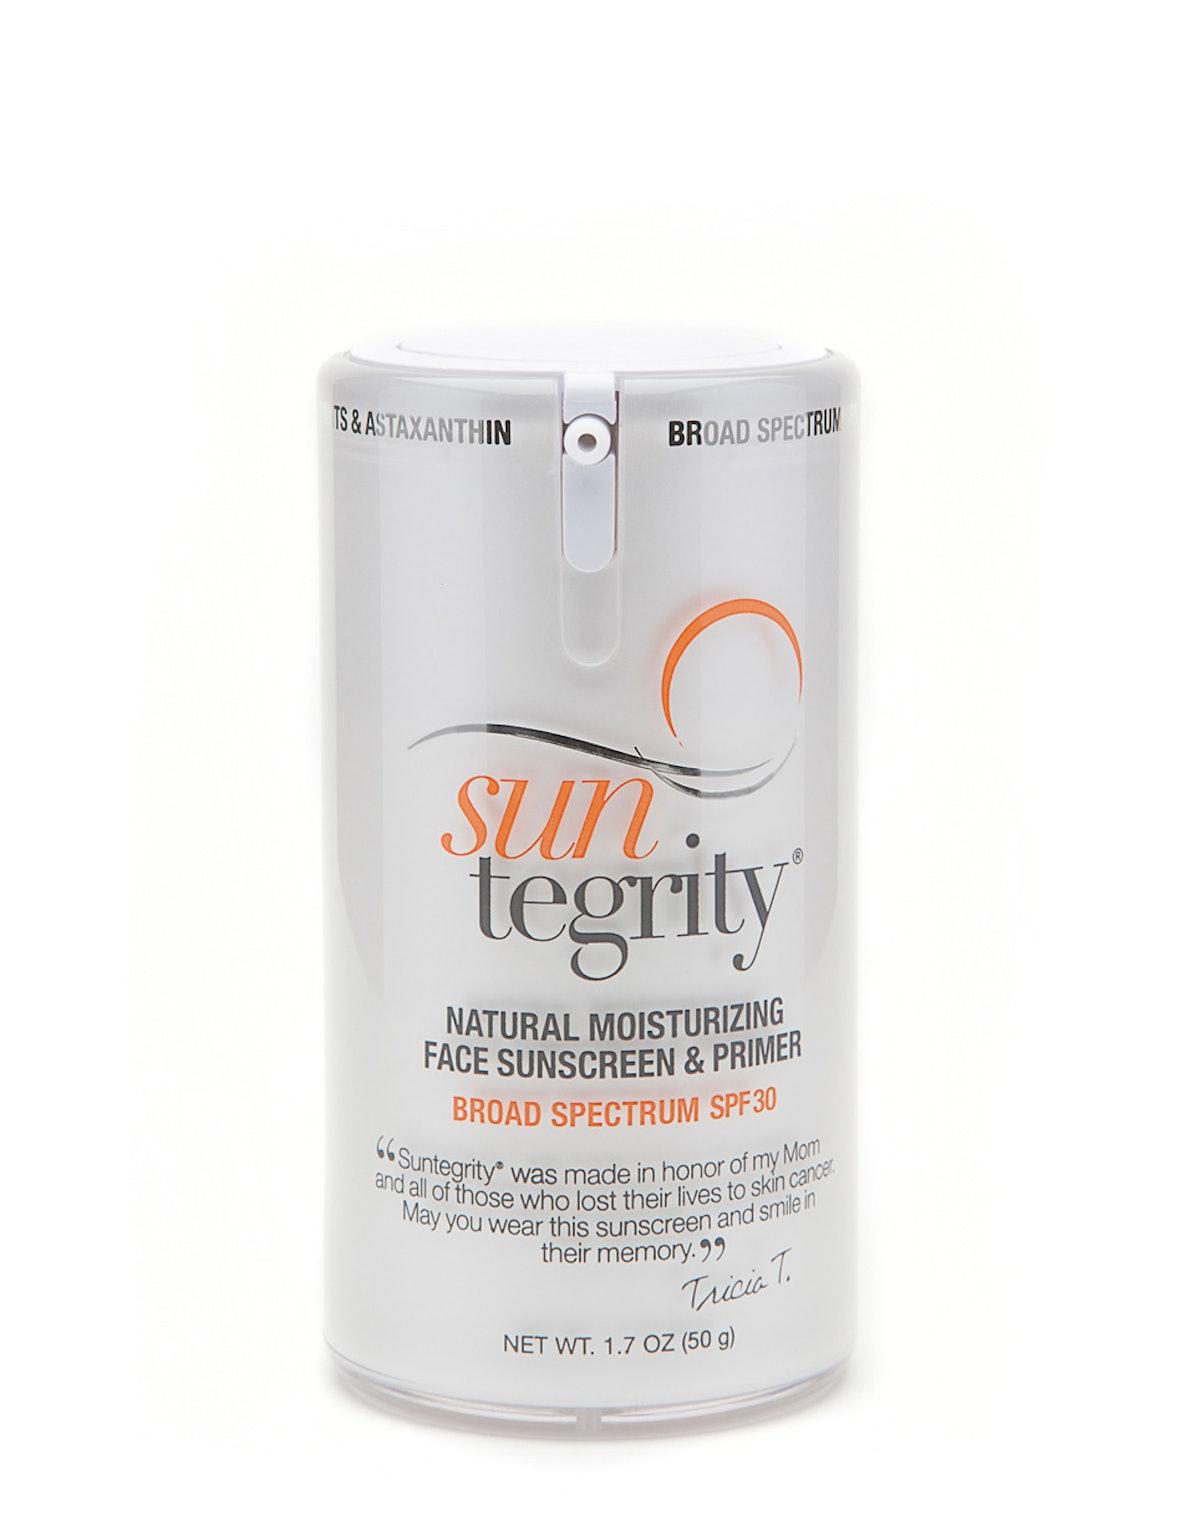 Suntegrity Natural Moisturizing Face Sunscreen & Primer